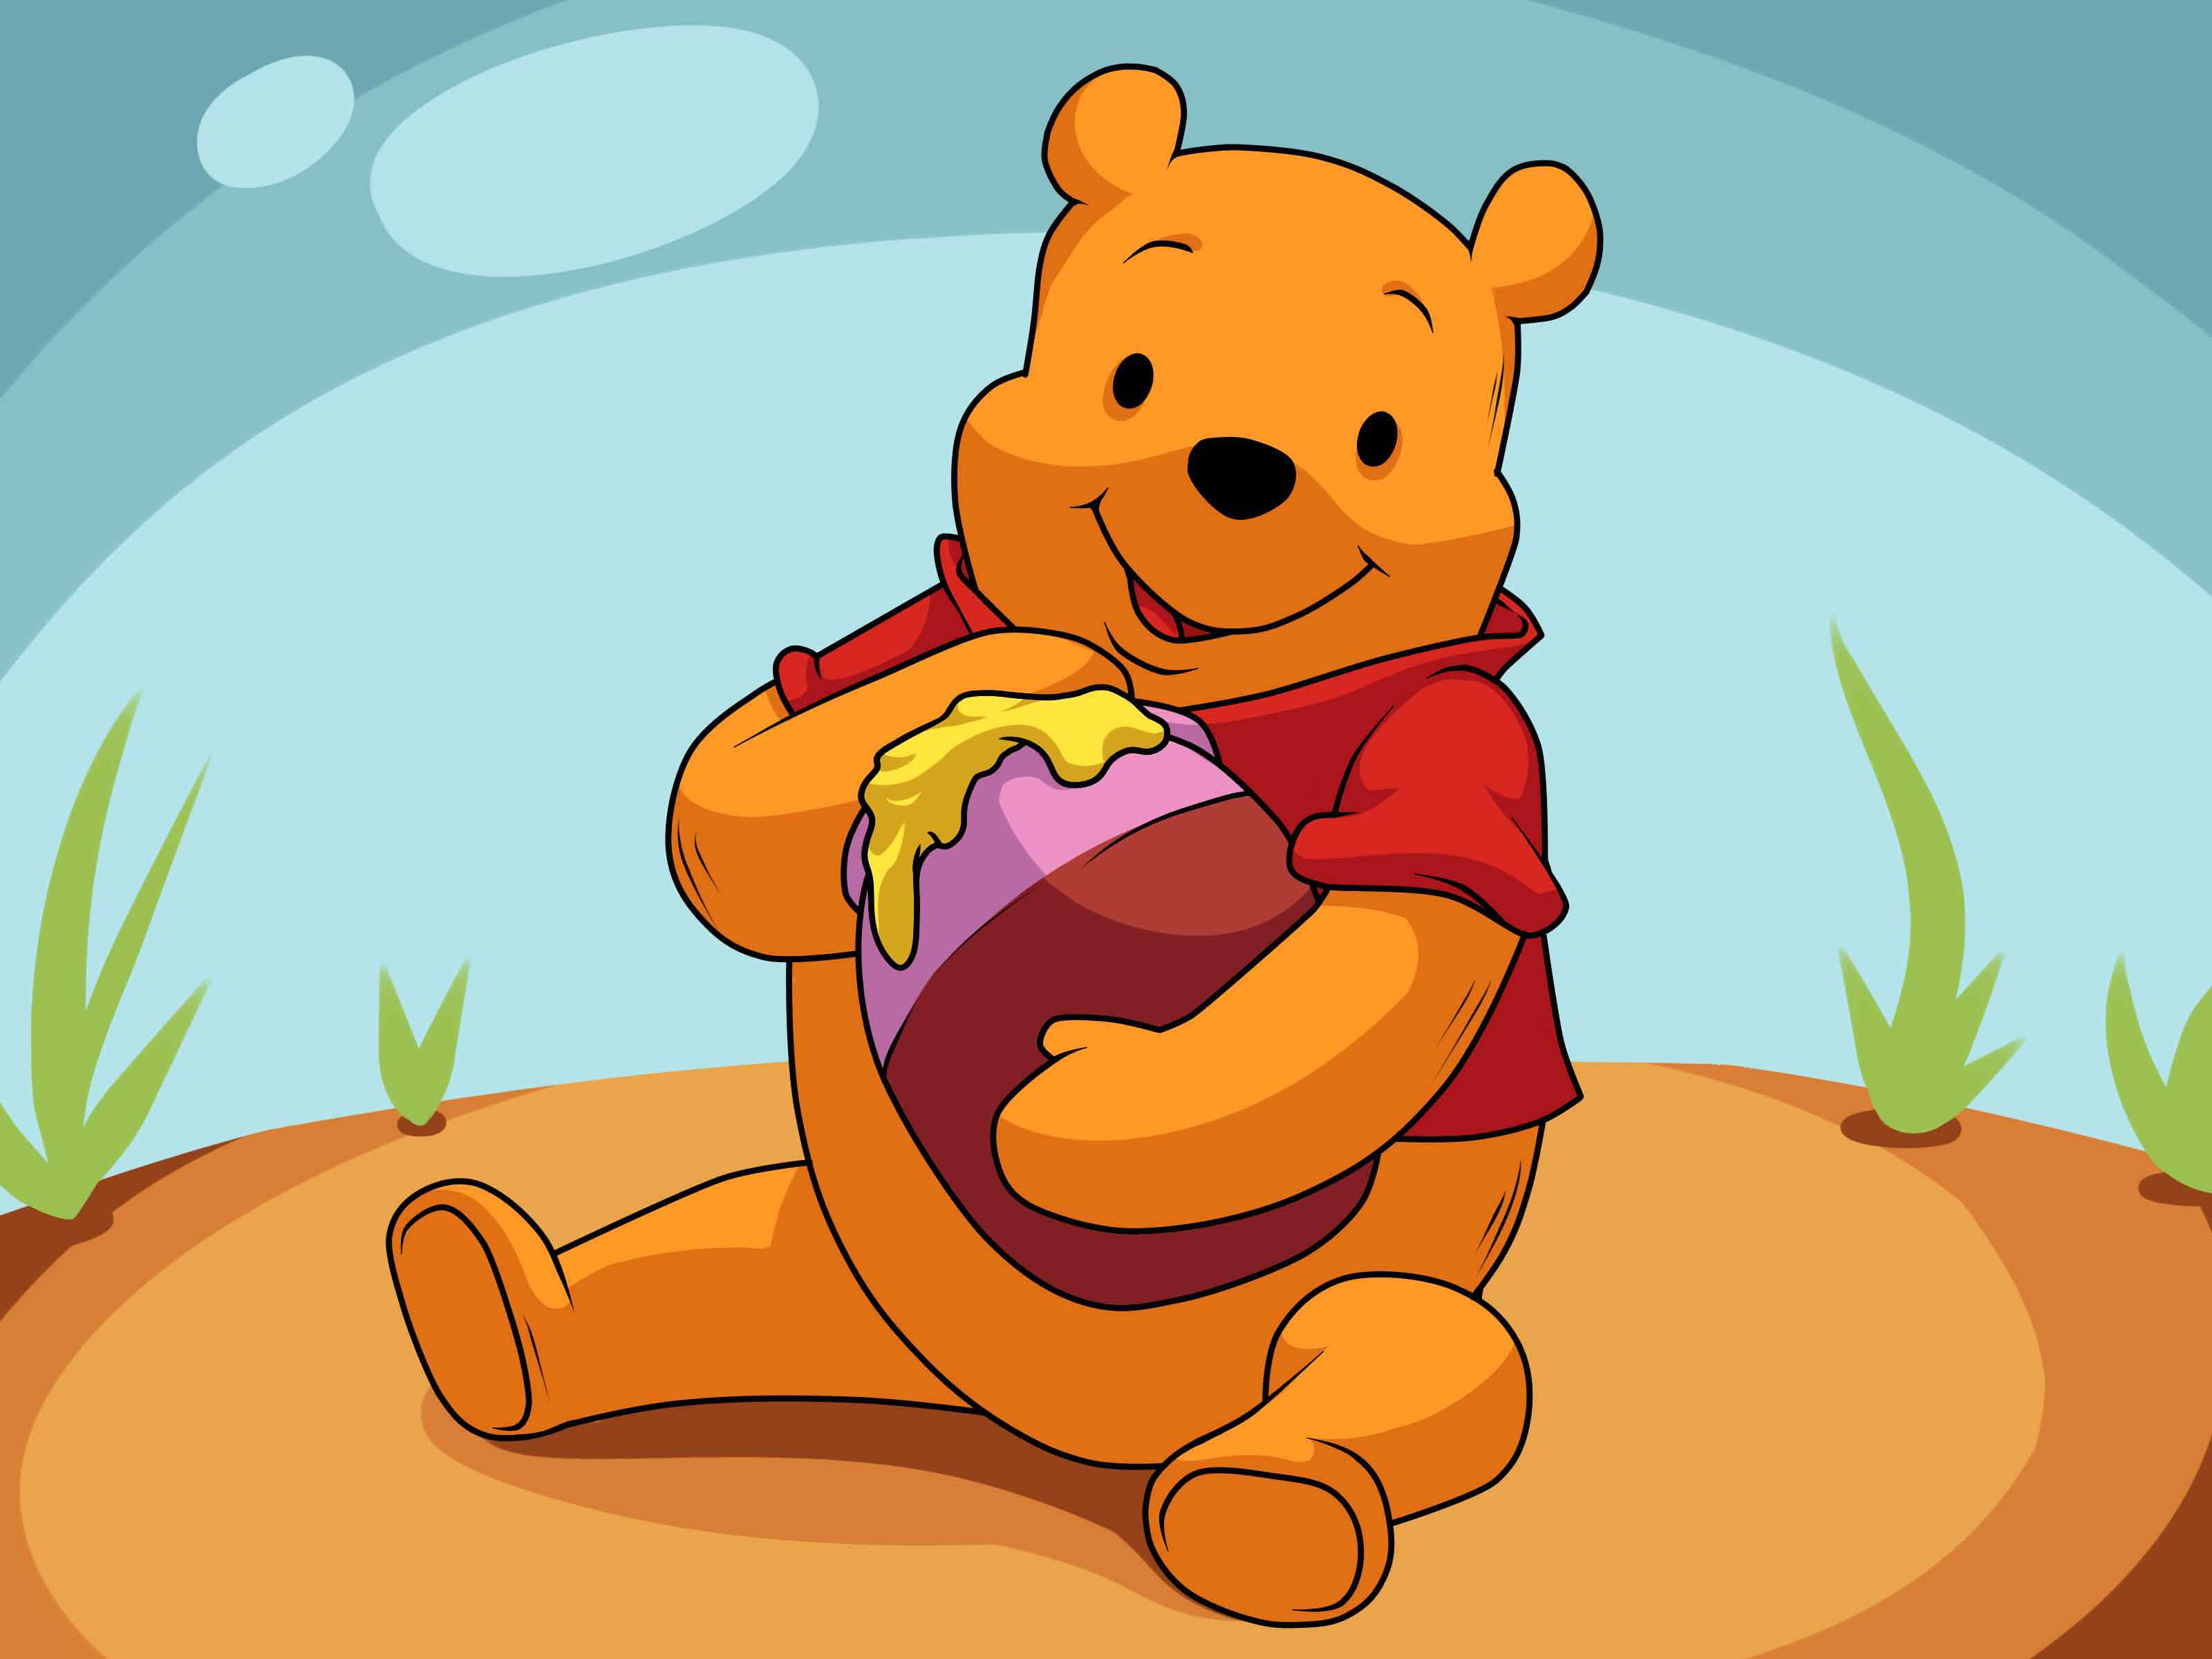 Winnie The Pooh Itu Laki Laki Atau Perempuan